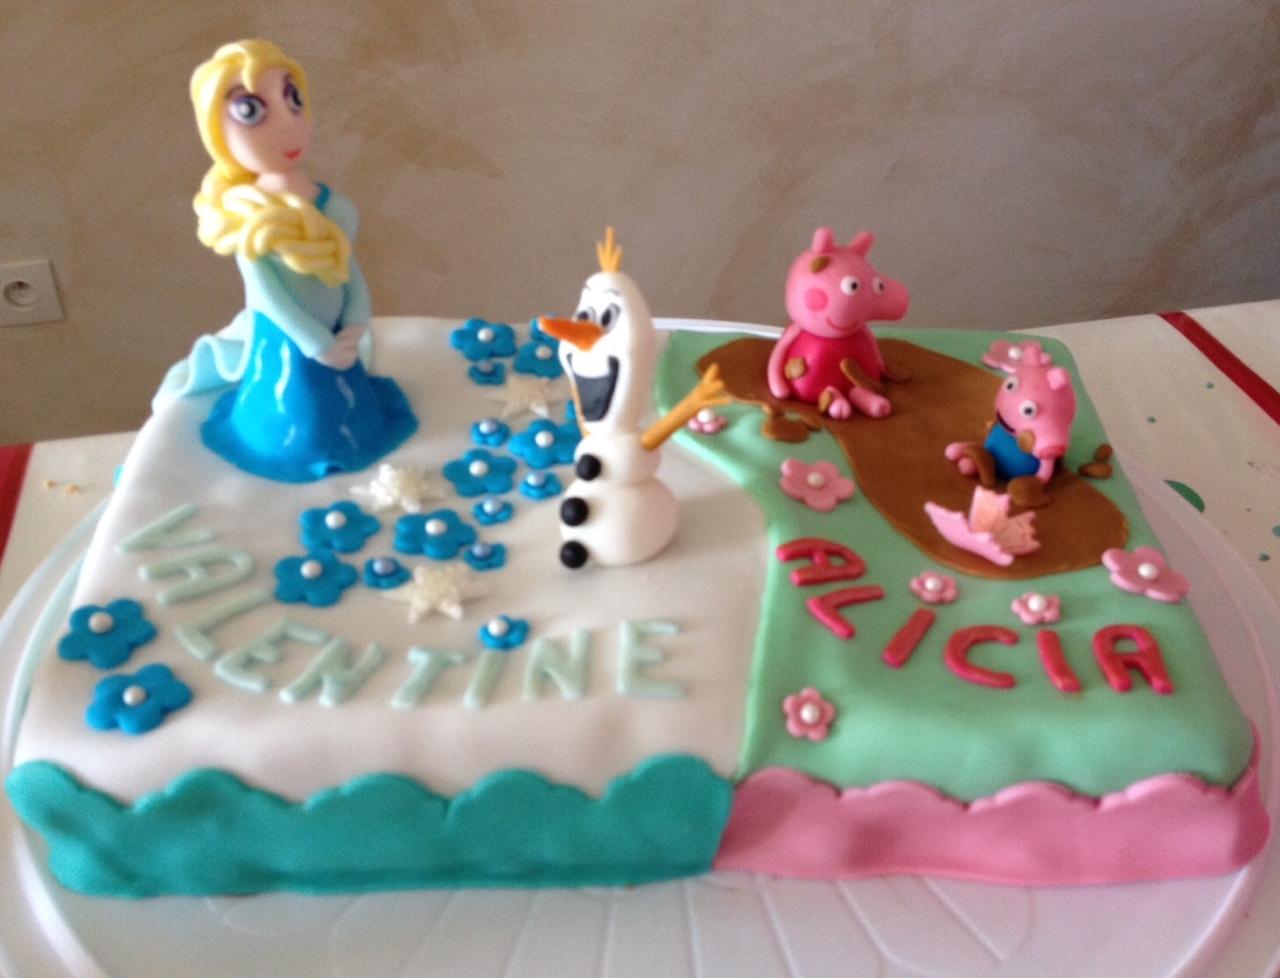 Pin Cake Inscription Ideas Slideshow Cake on Pinterest